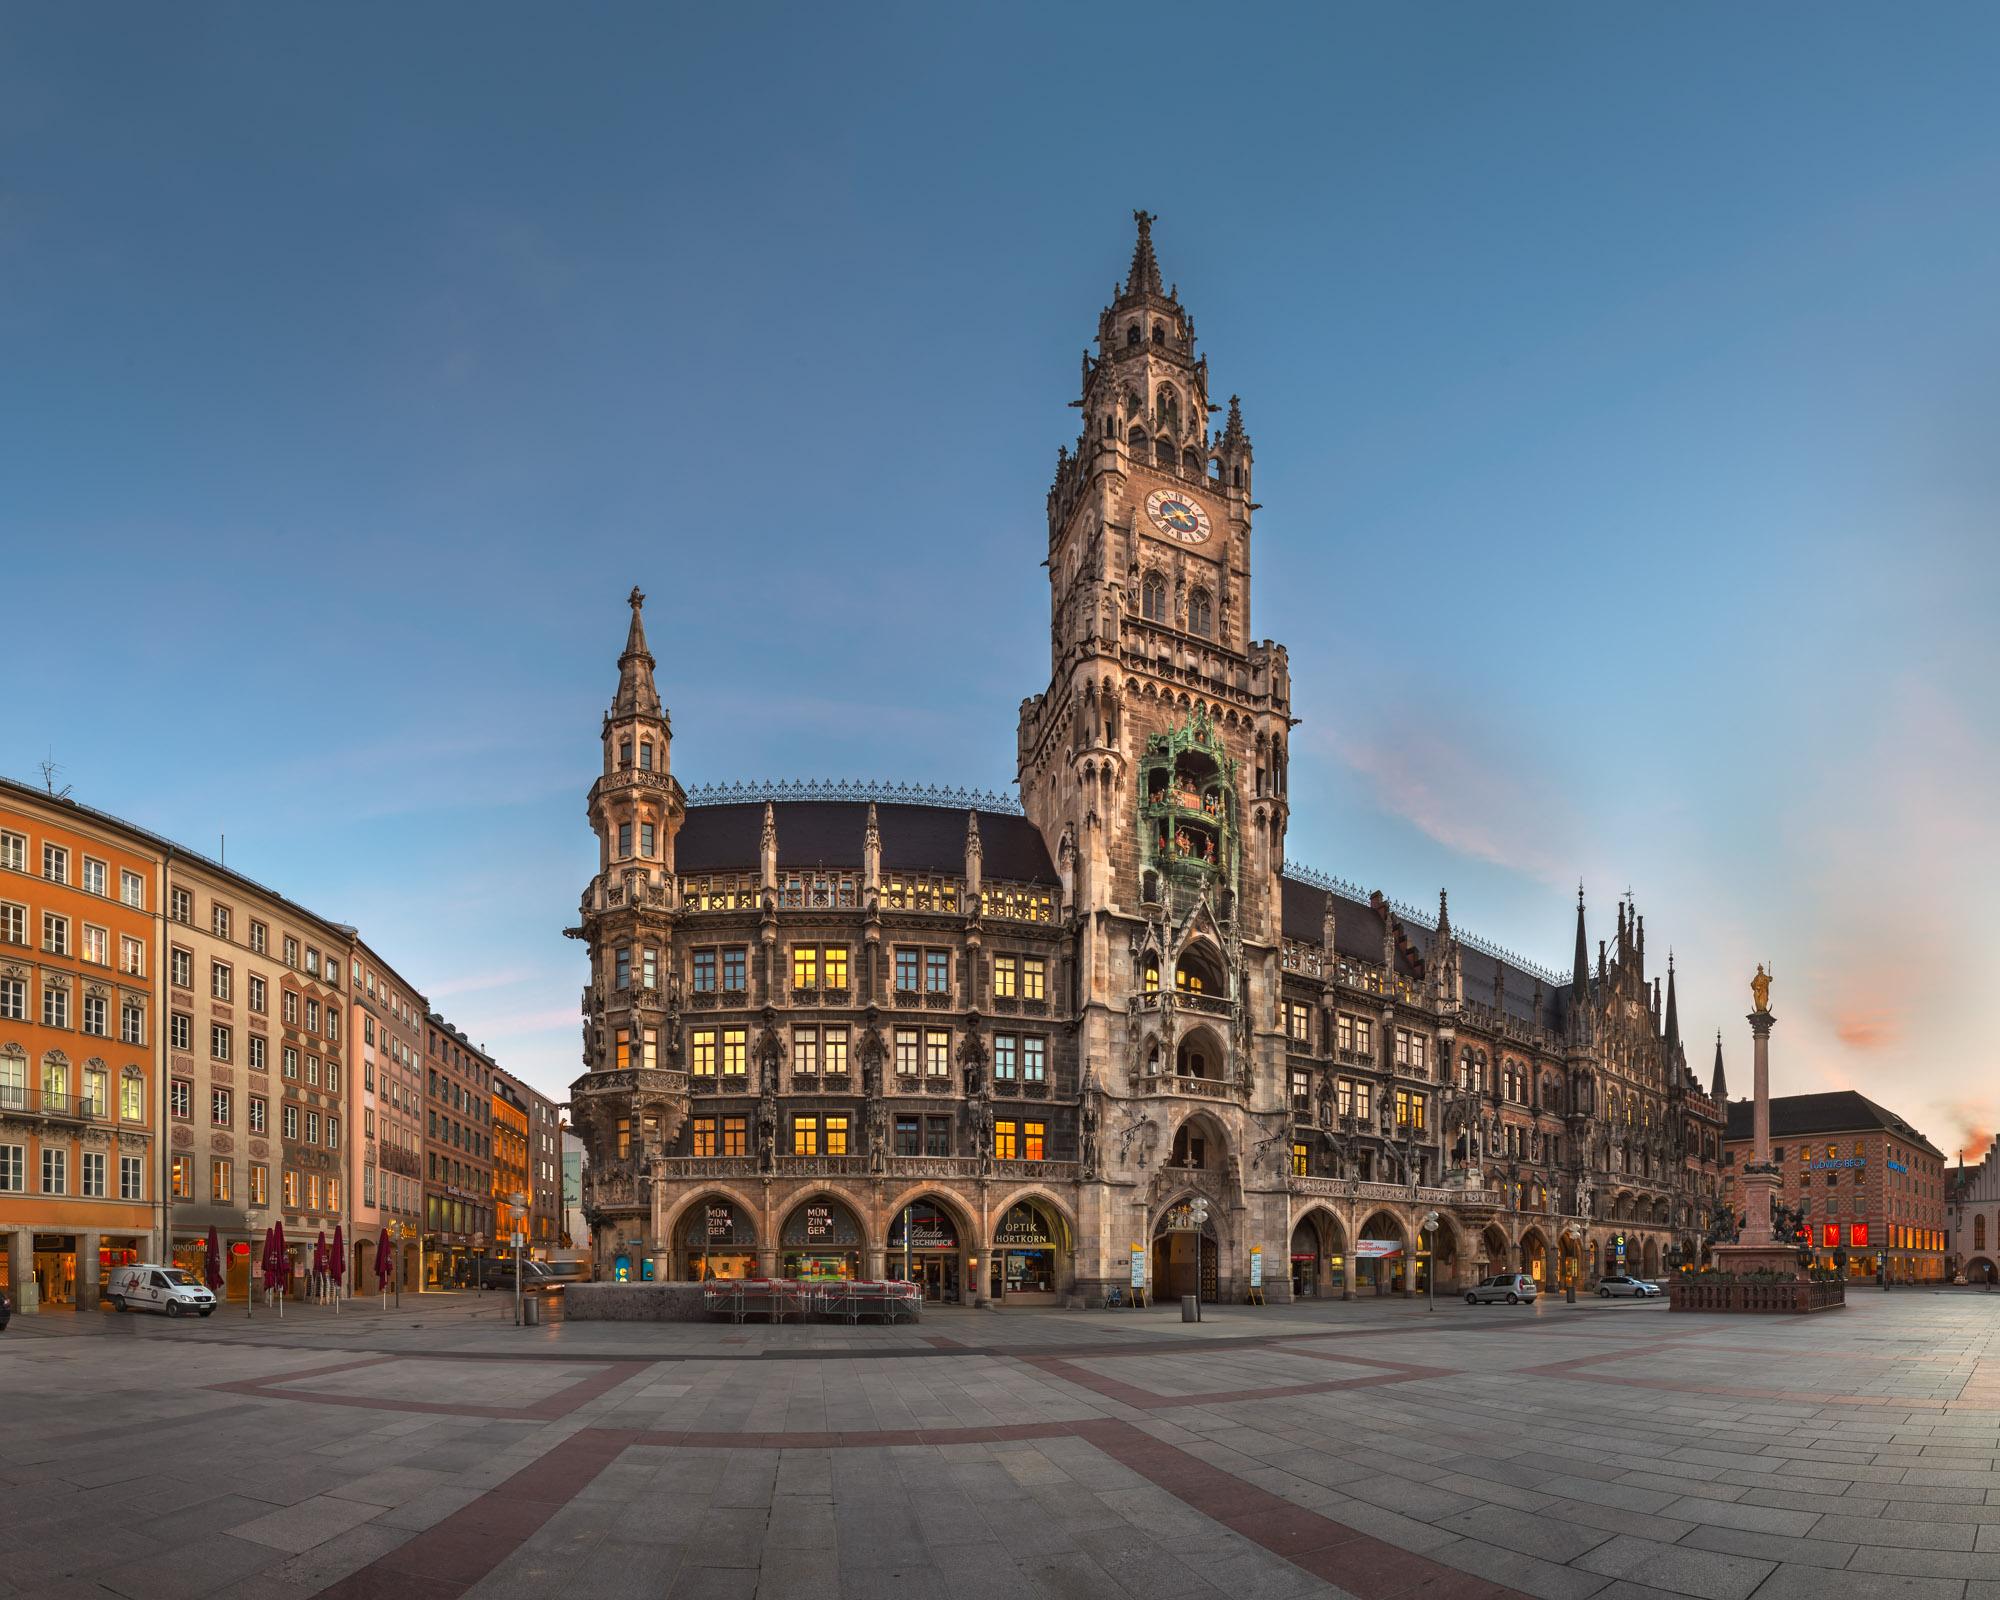 Panorama of Marienplatz and New Townhall, Munich, Germany